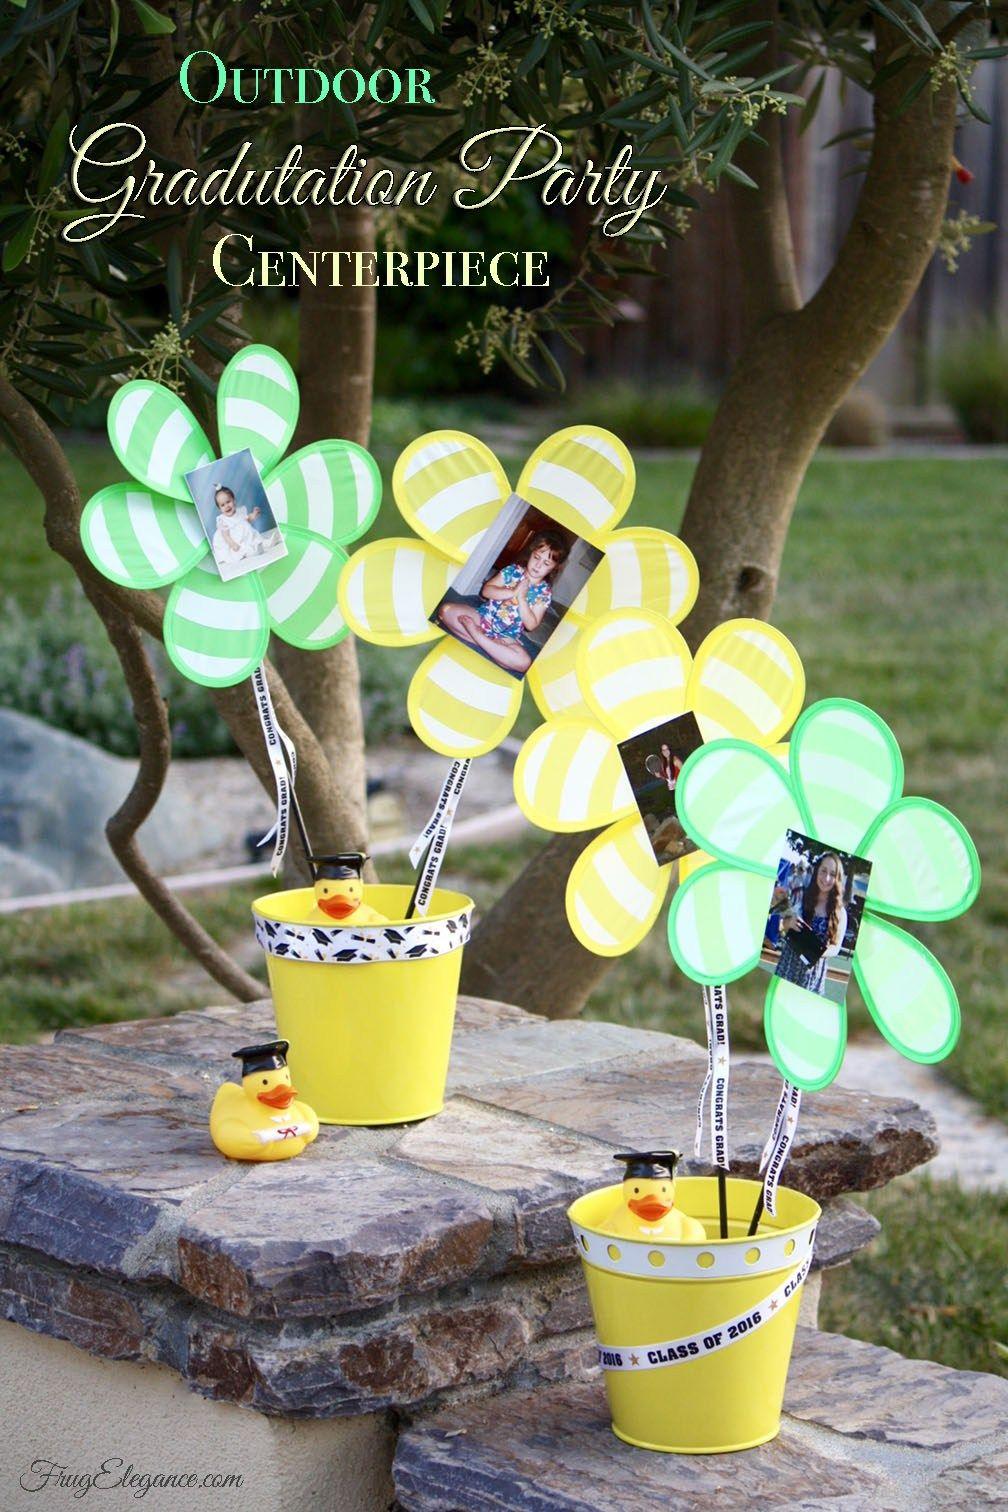 outdoor graduation party centerpieces frugelegance celebrations